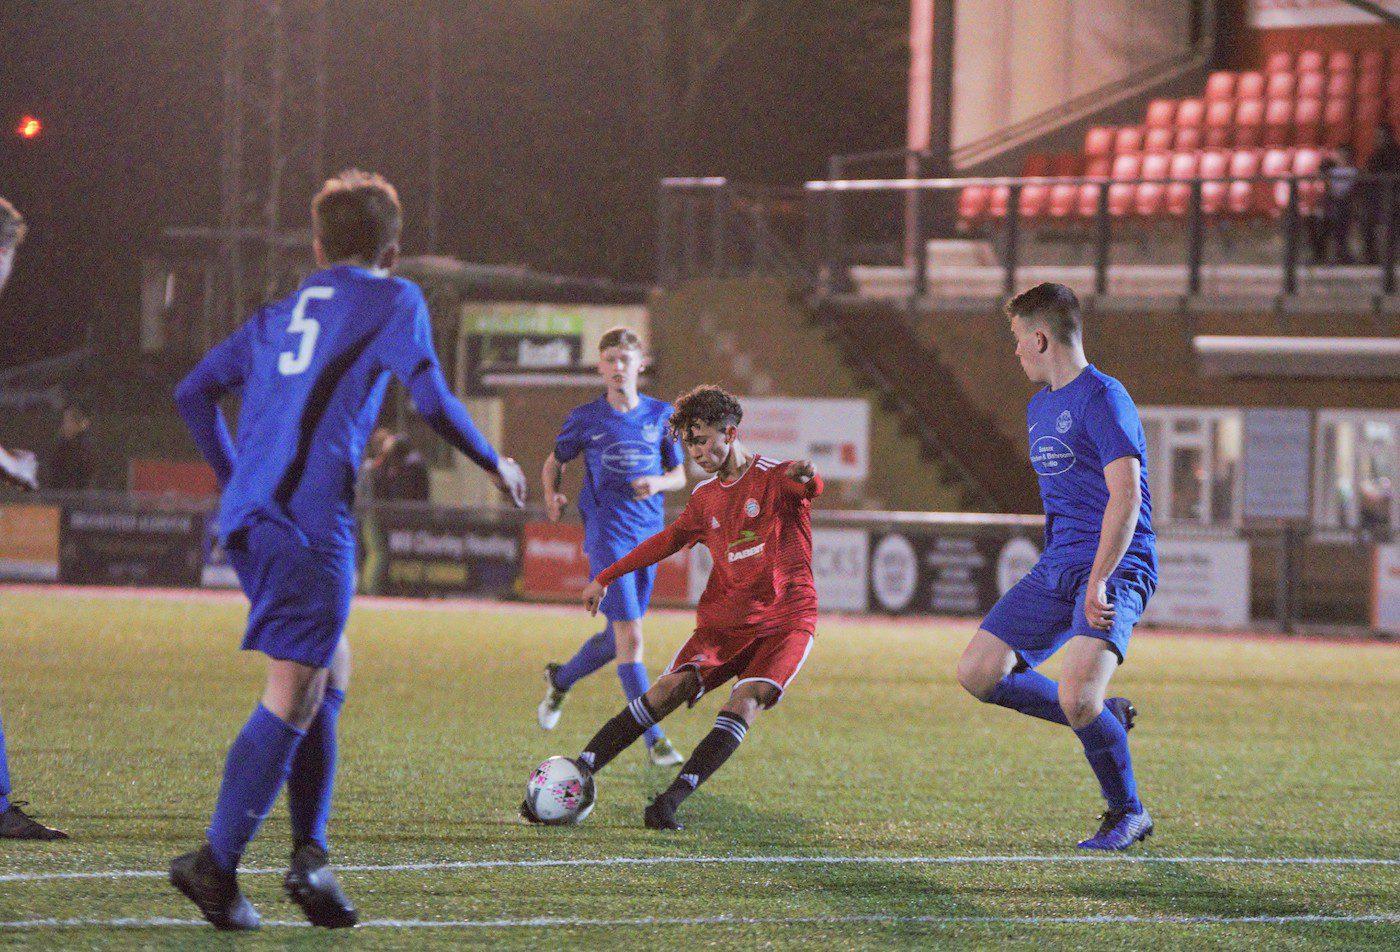 Read the full article - HIGHLIGHTS: U18's 8-0 Shoreham [H] – LEAGUE